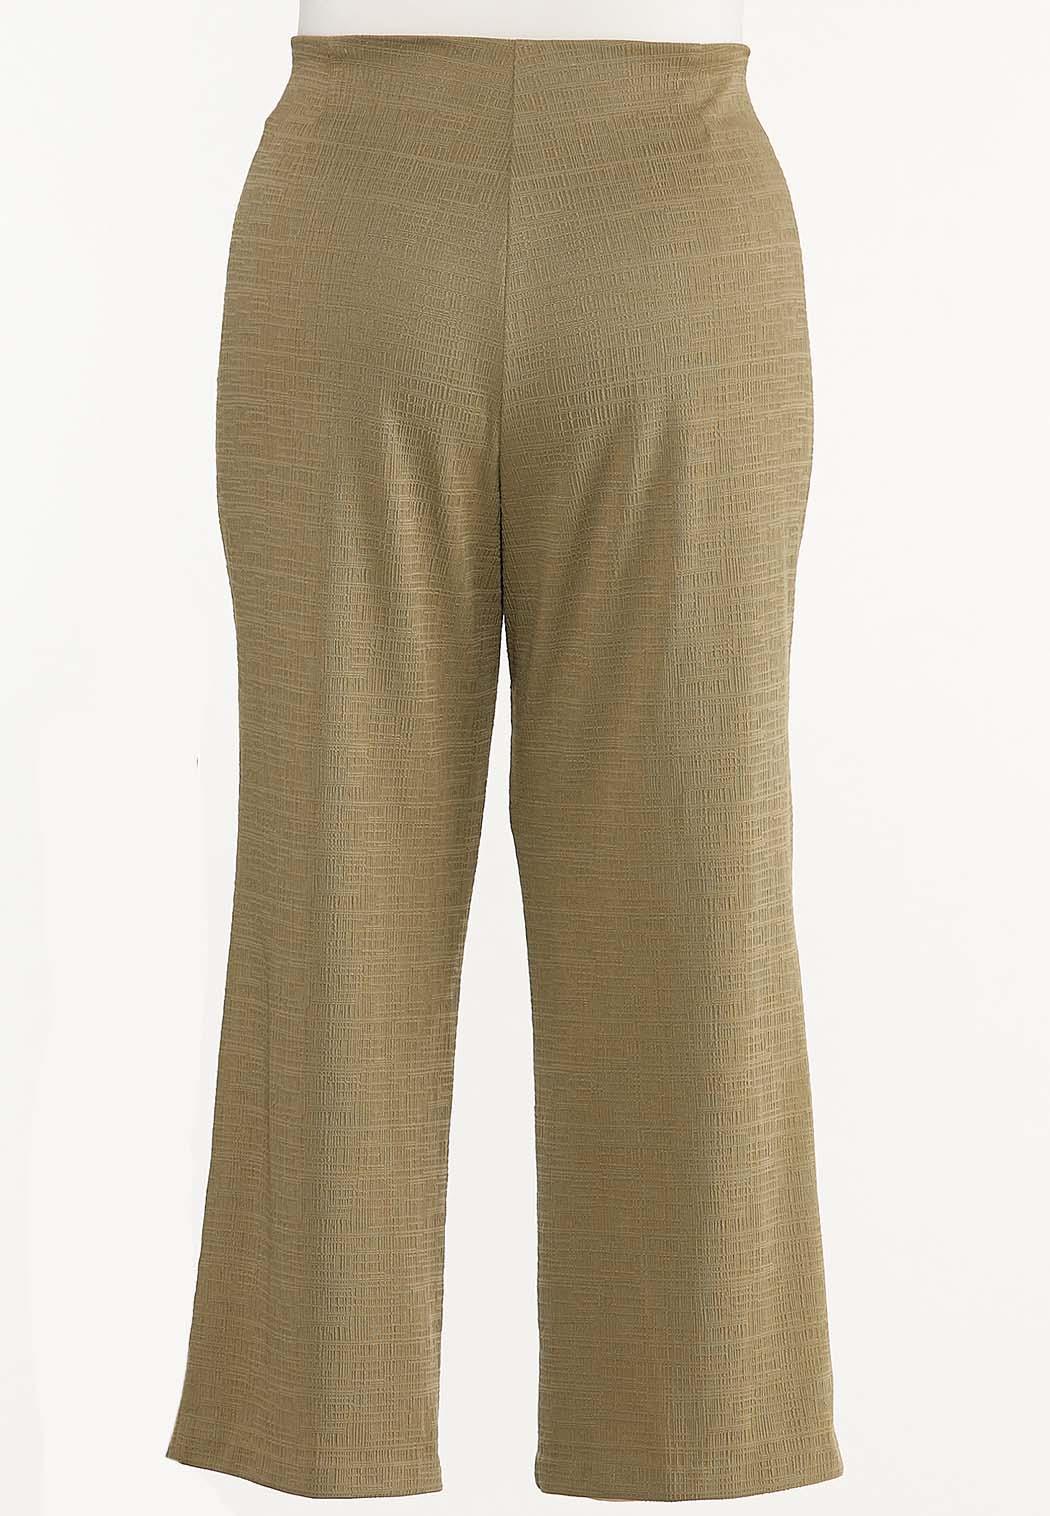 Plus Size Textured Self-Tie Pants (Item #44491537)